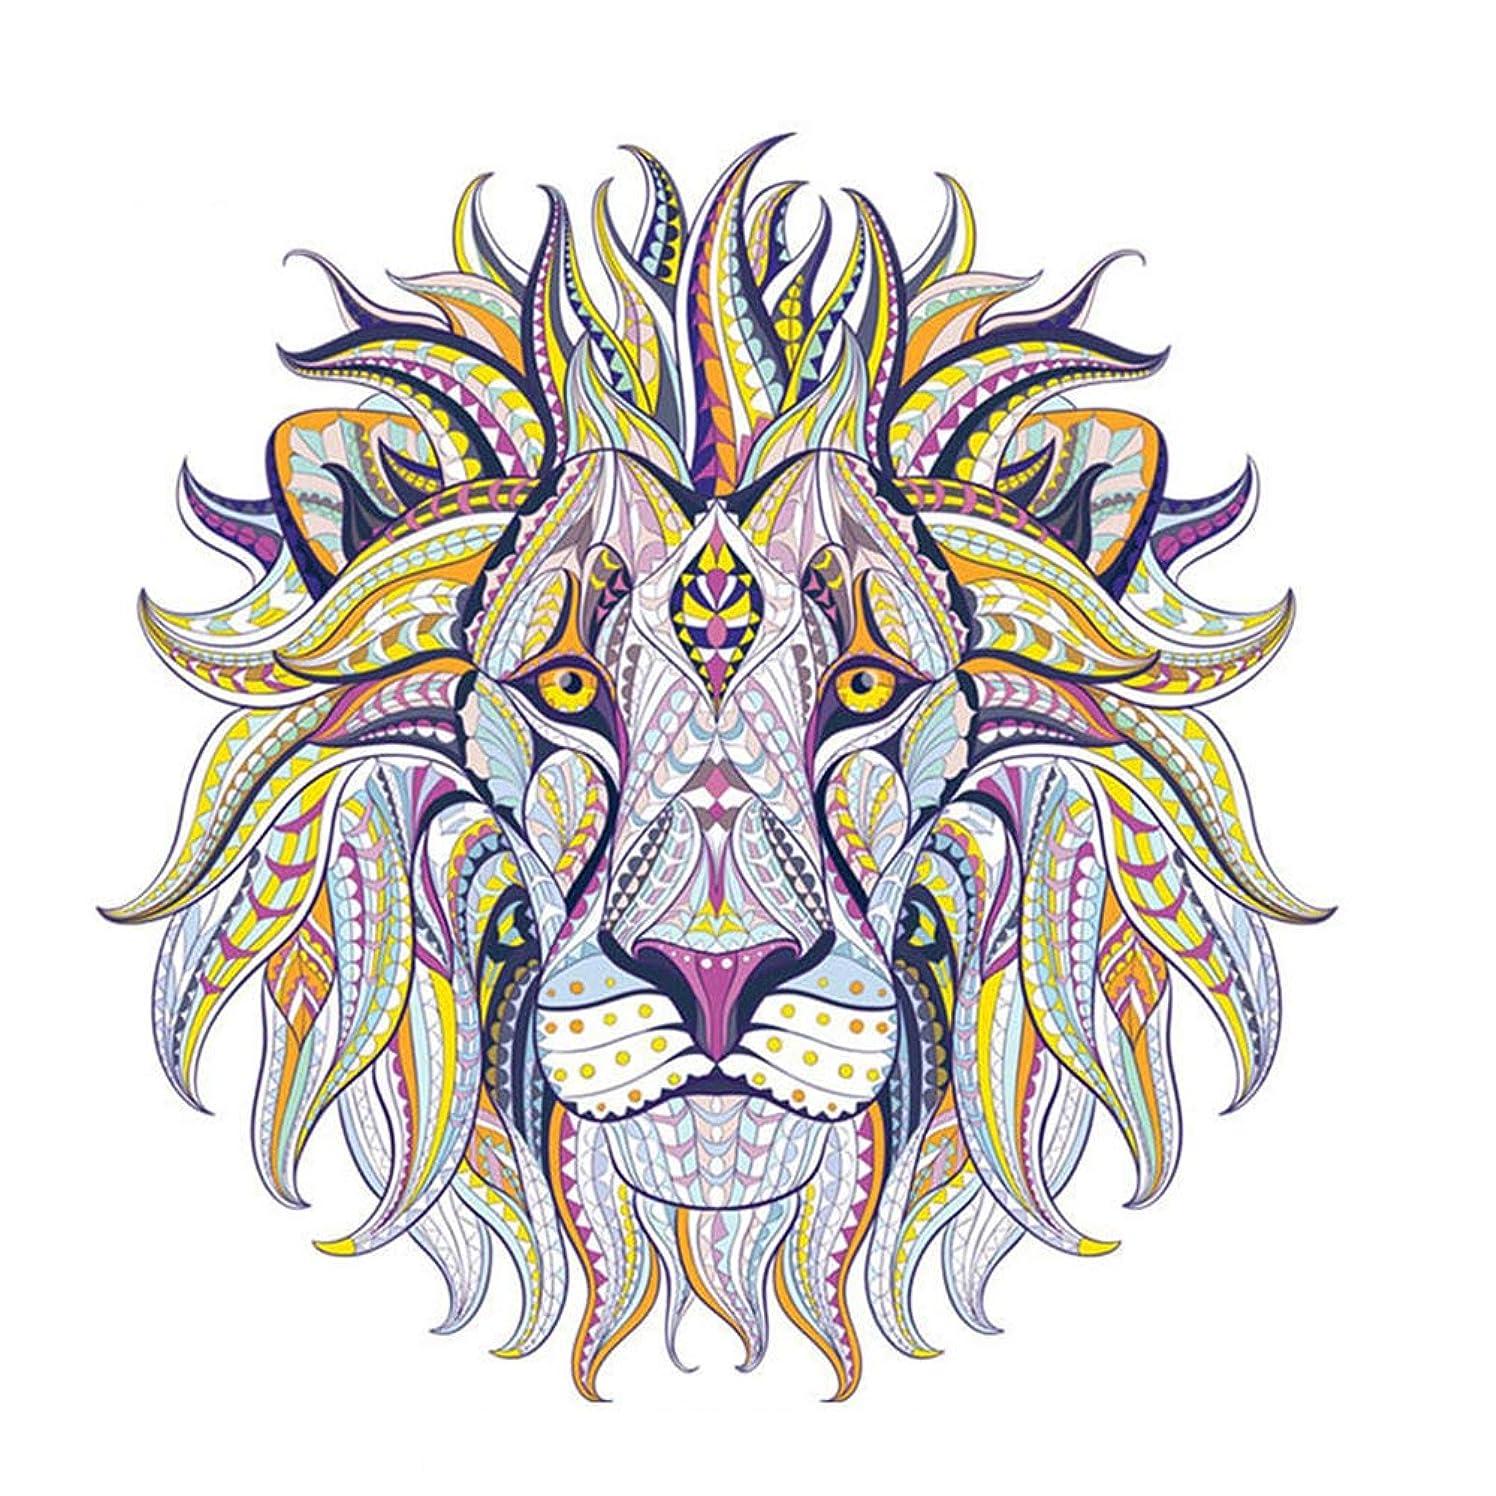 Artem 9.3x9.4inch Lion Patches for Clothes Iron On Patches A-Level Washable DIY Decoration T-Shirt Dresses Appliques